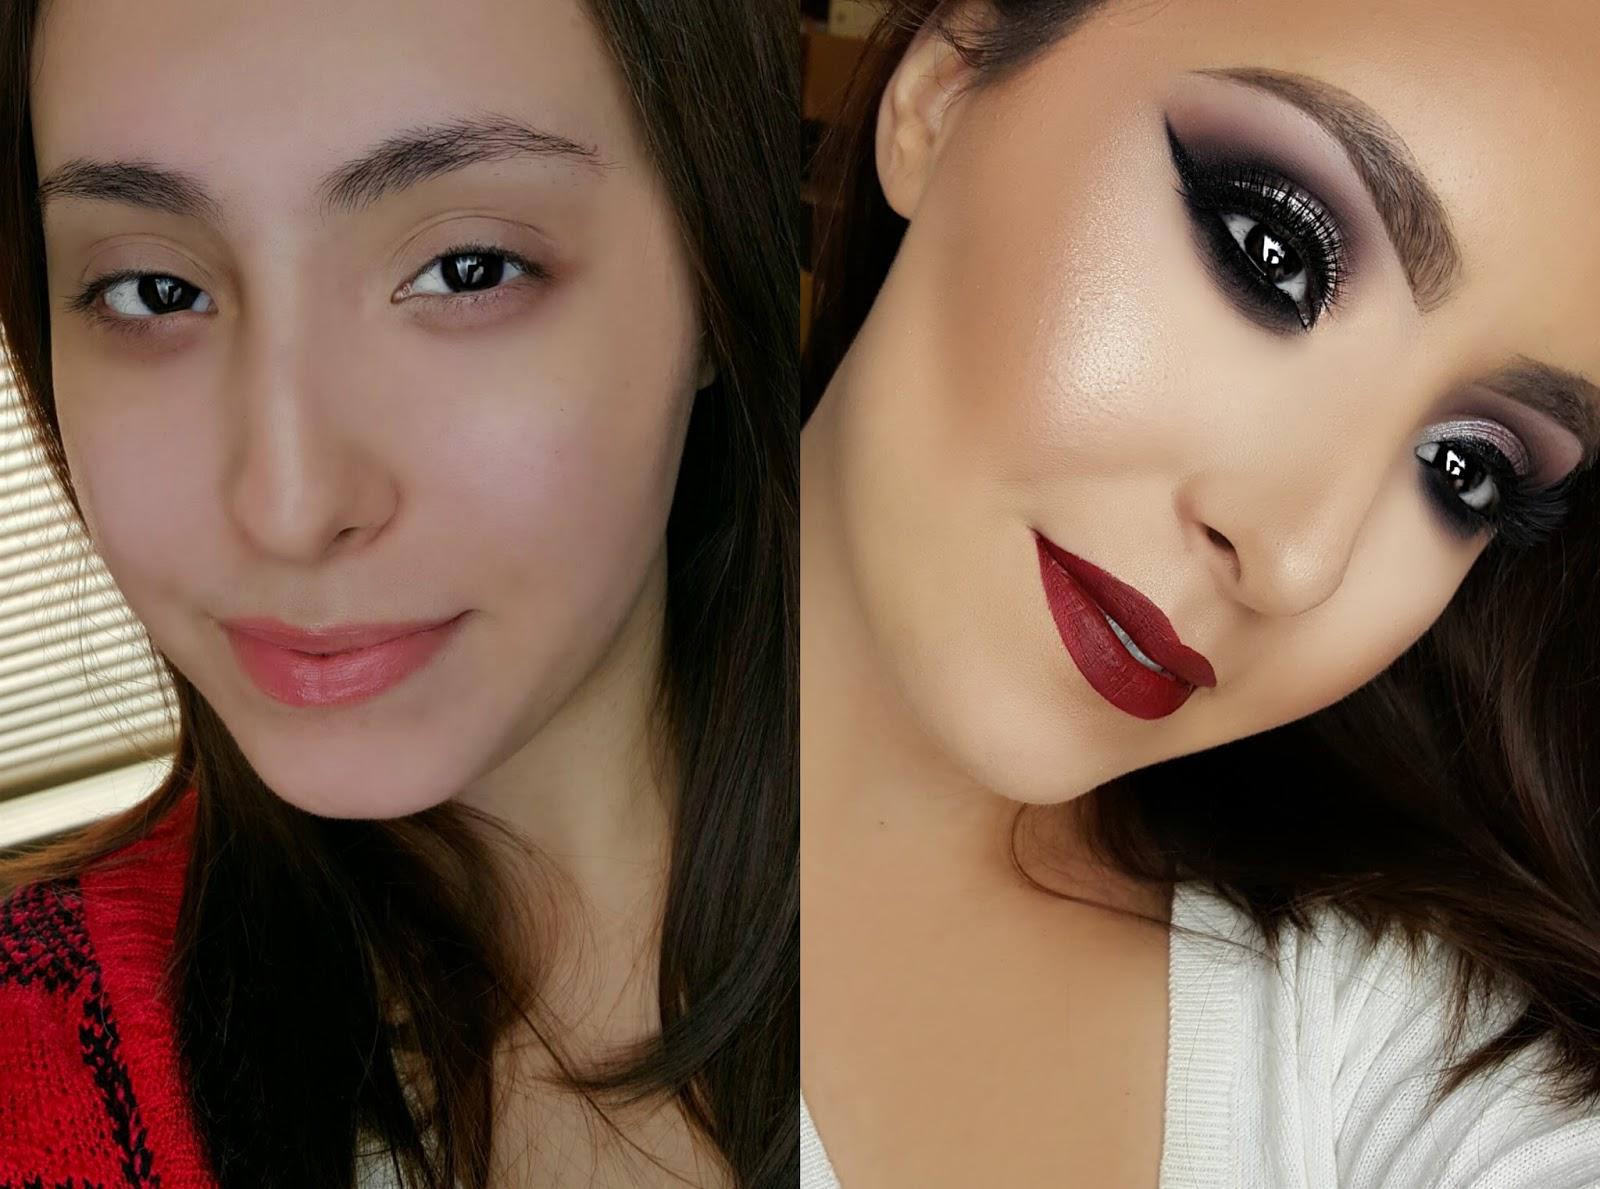 What makeup should i wear